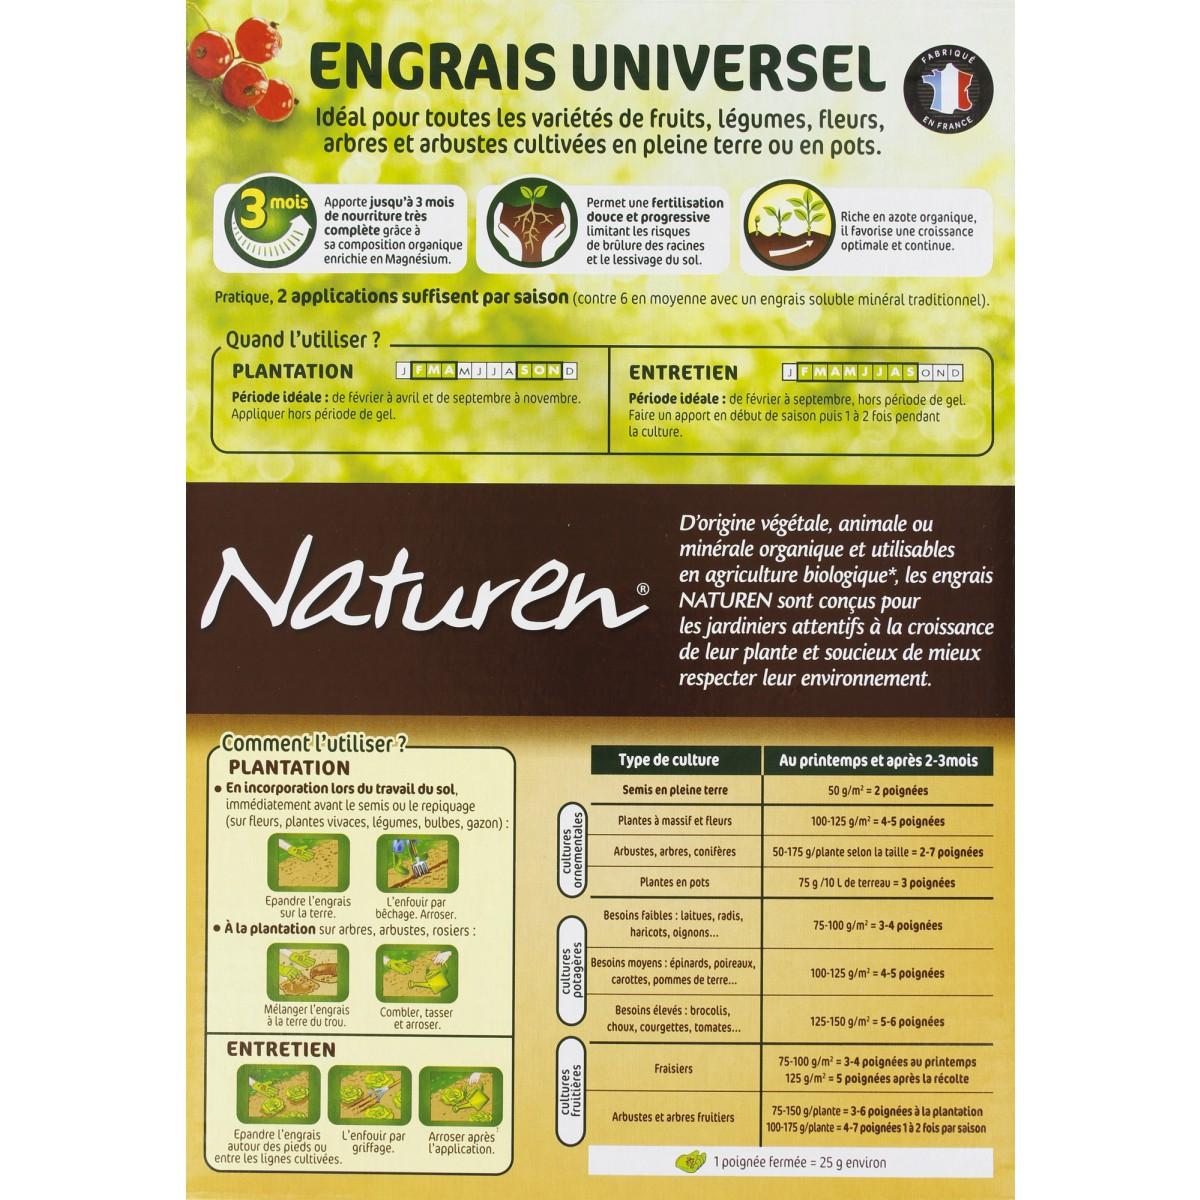 Engrais universel Naturen